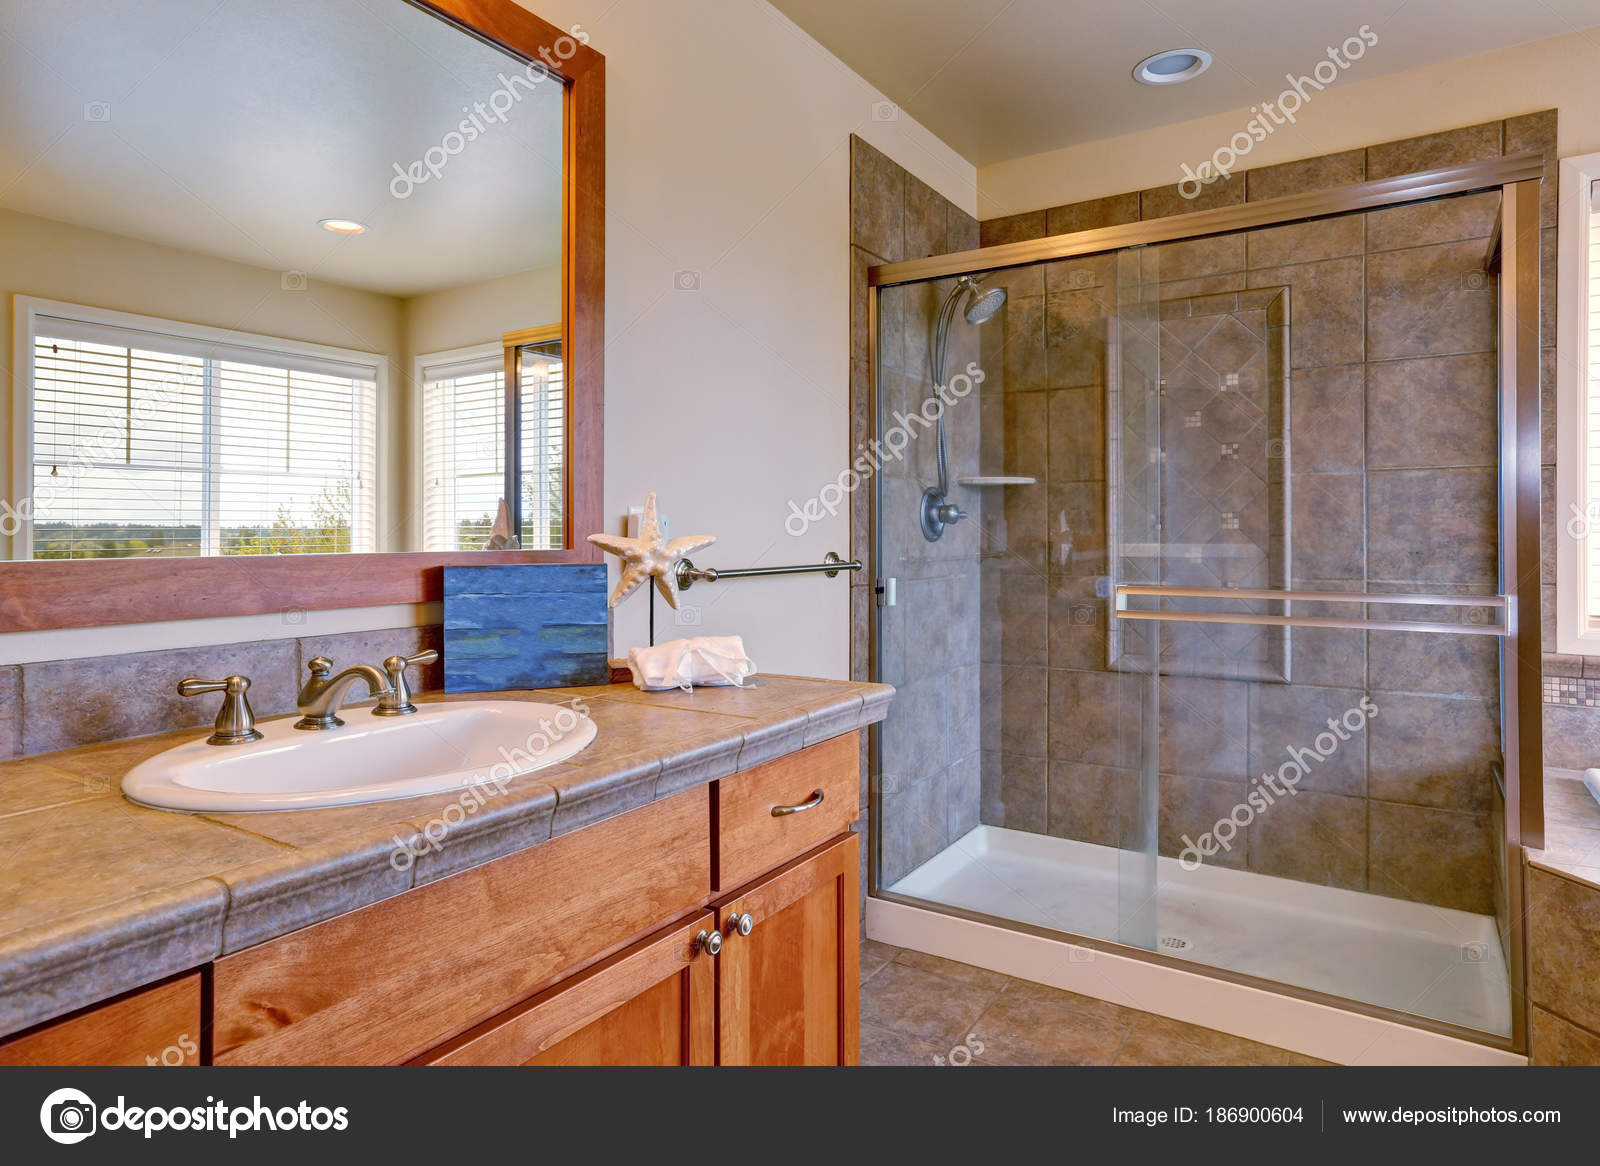 Splendida spa come bagno con due vanity armadi — Foto Stock ...